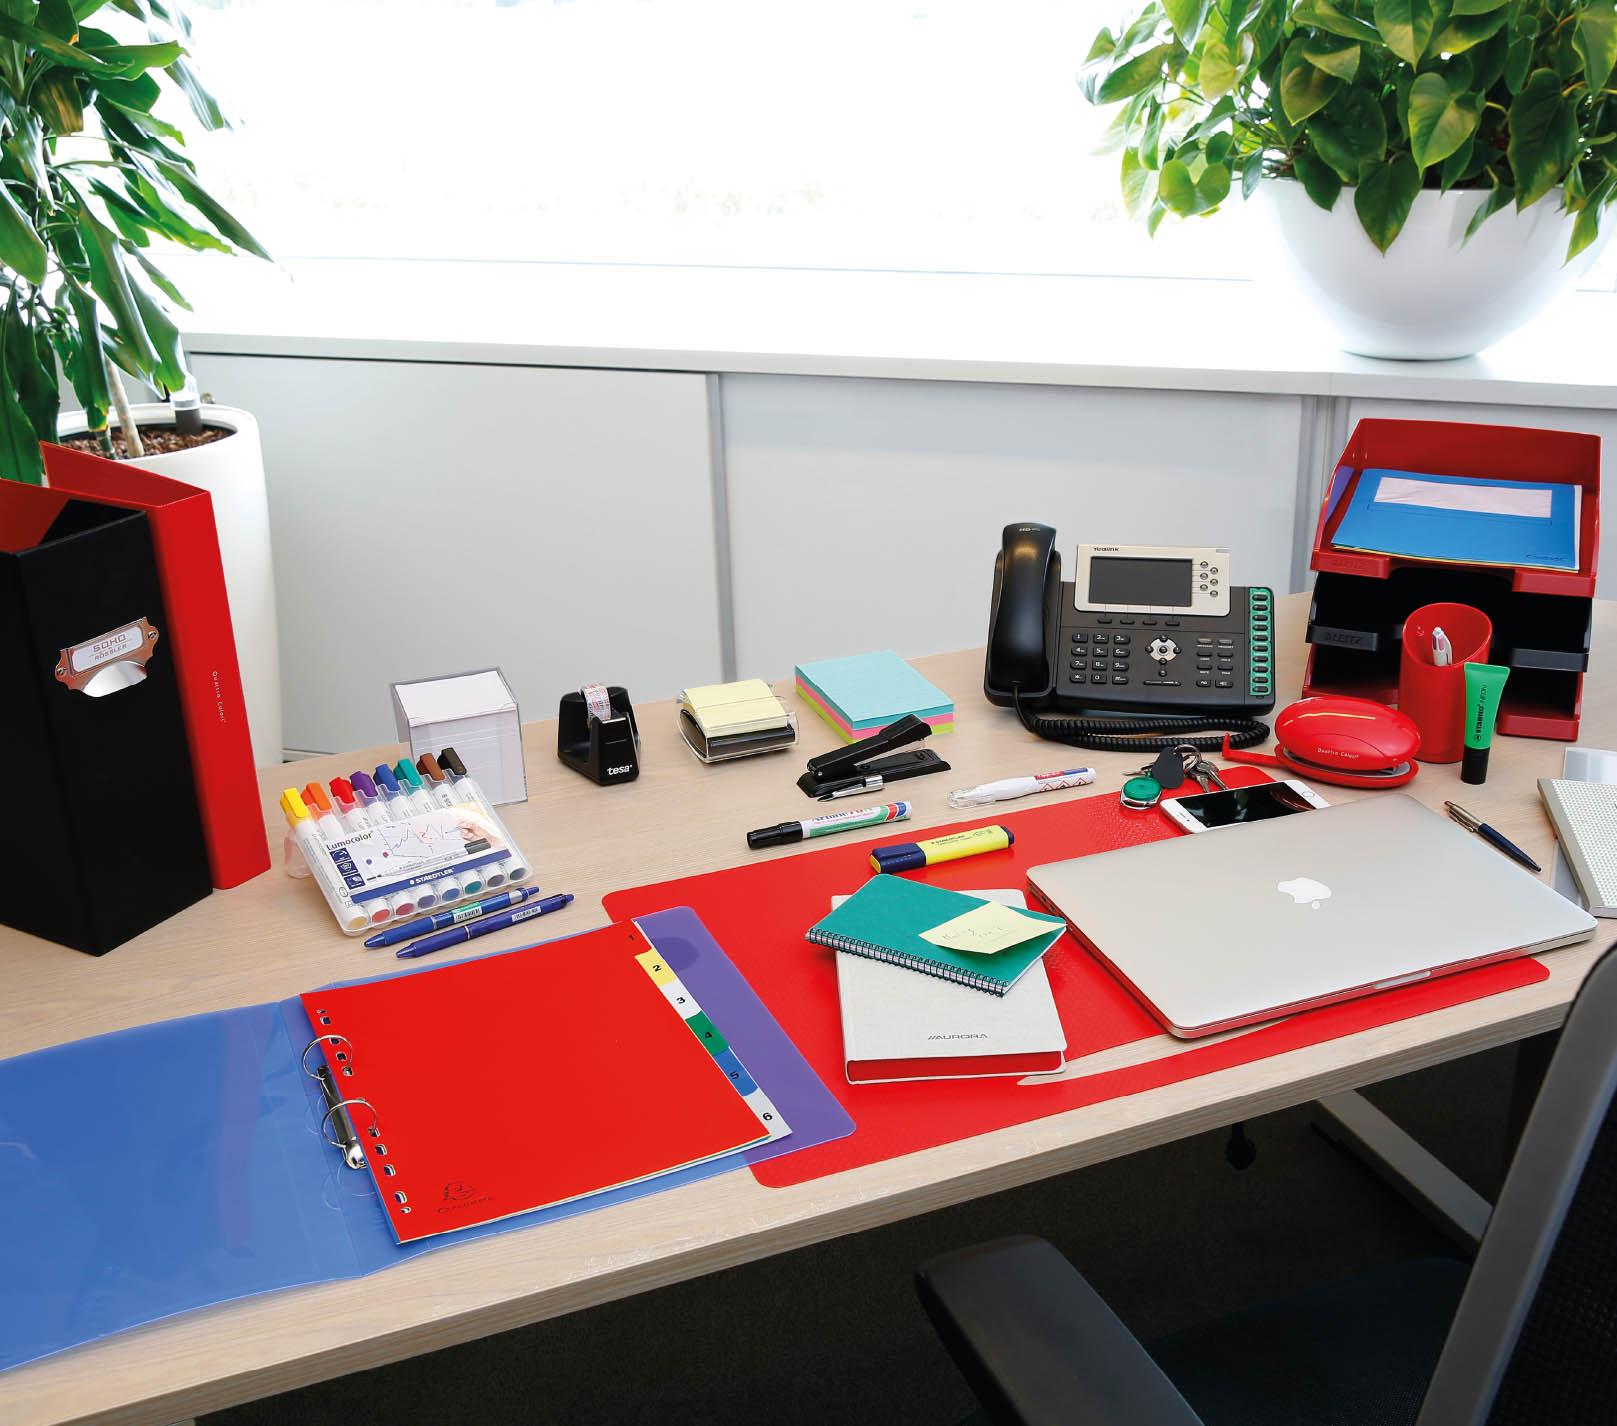 Alles om je bureau perfect in te richten.